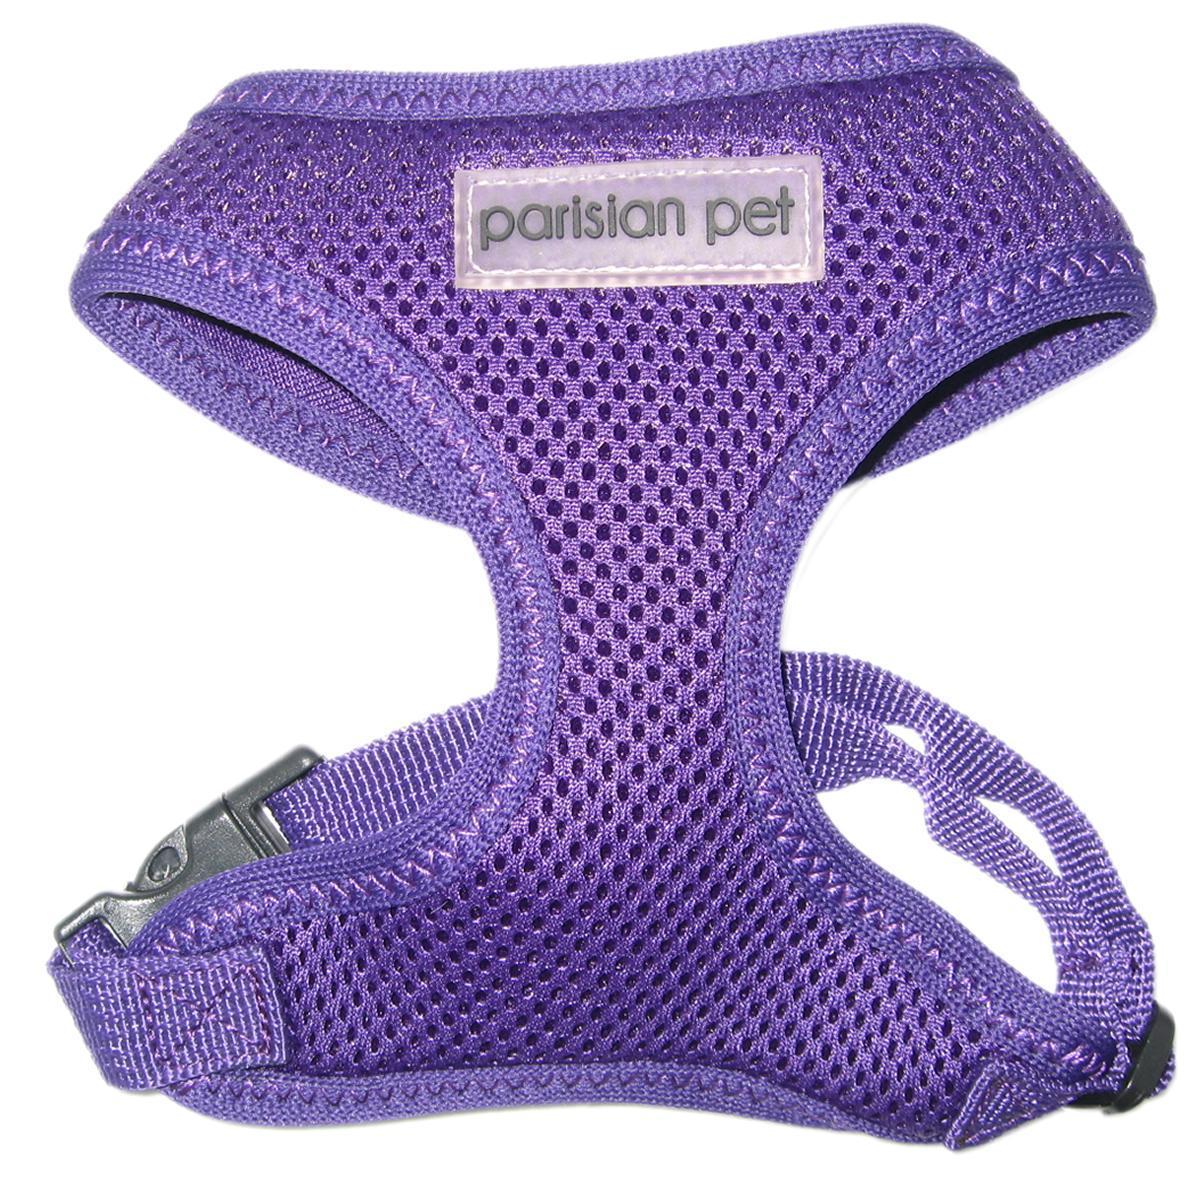 Parisian Pet Mesh Freedom Dog Harness - Lilac